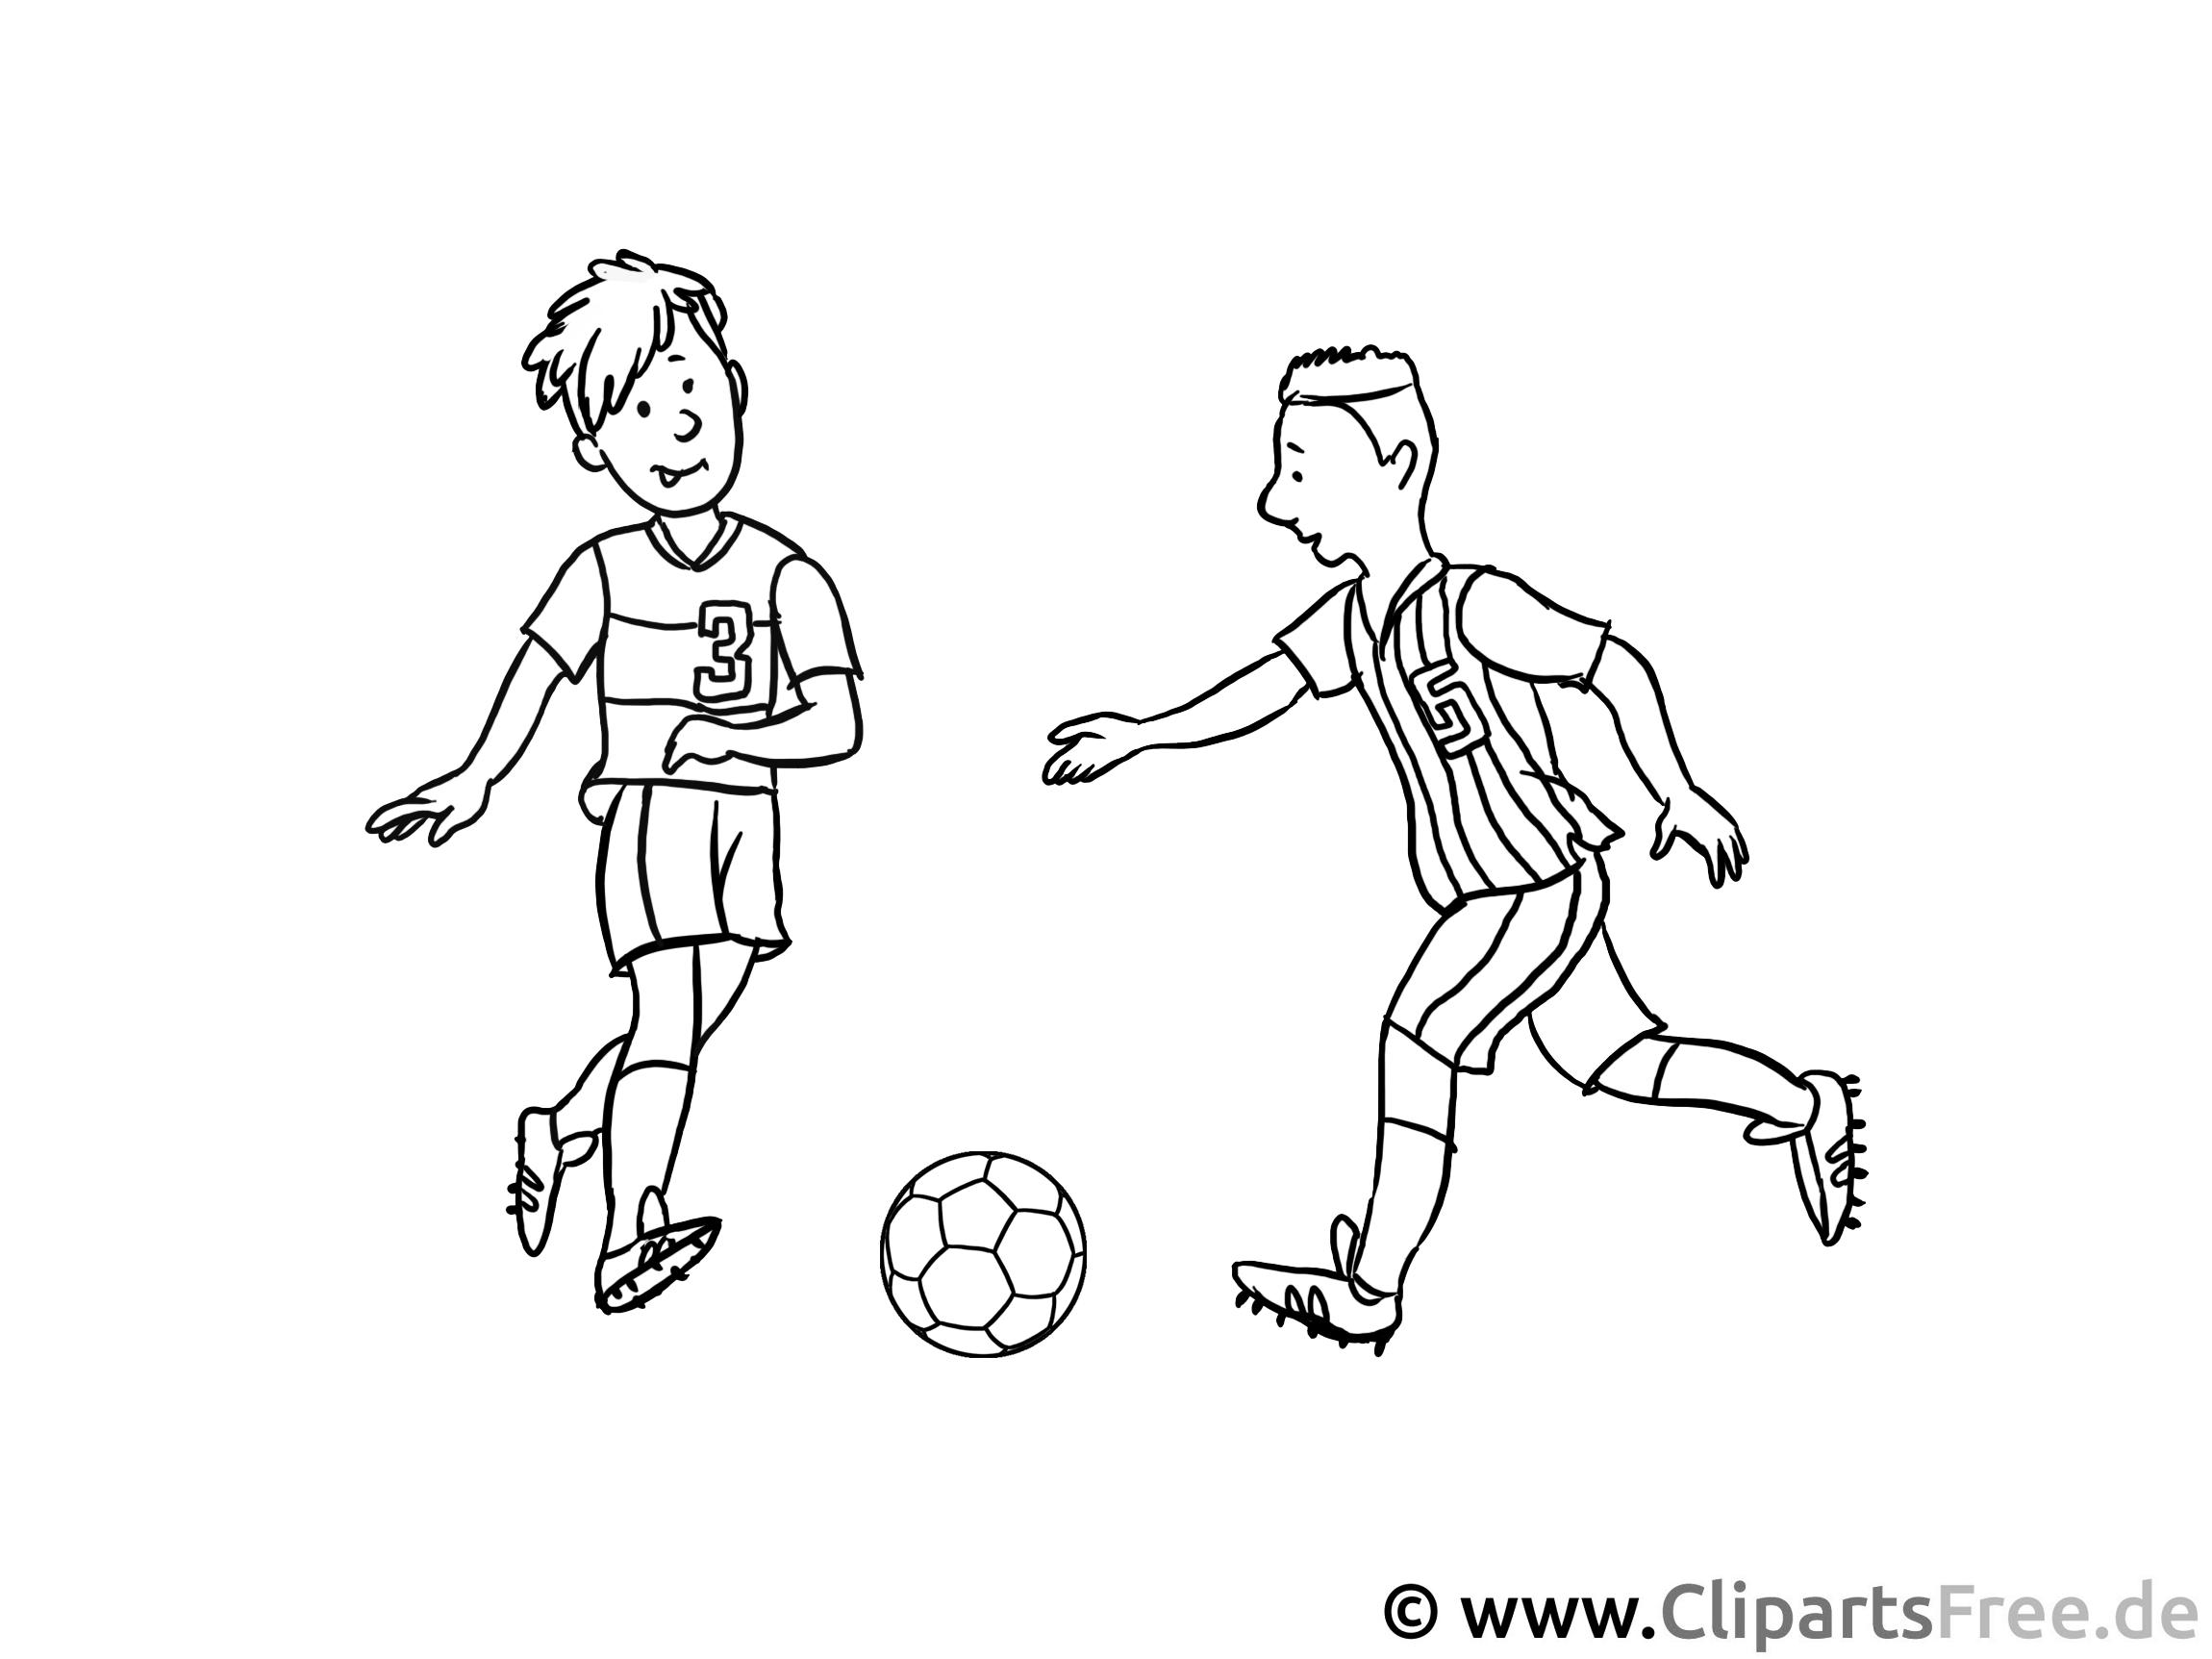 malvorlagen fussball